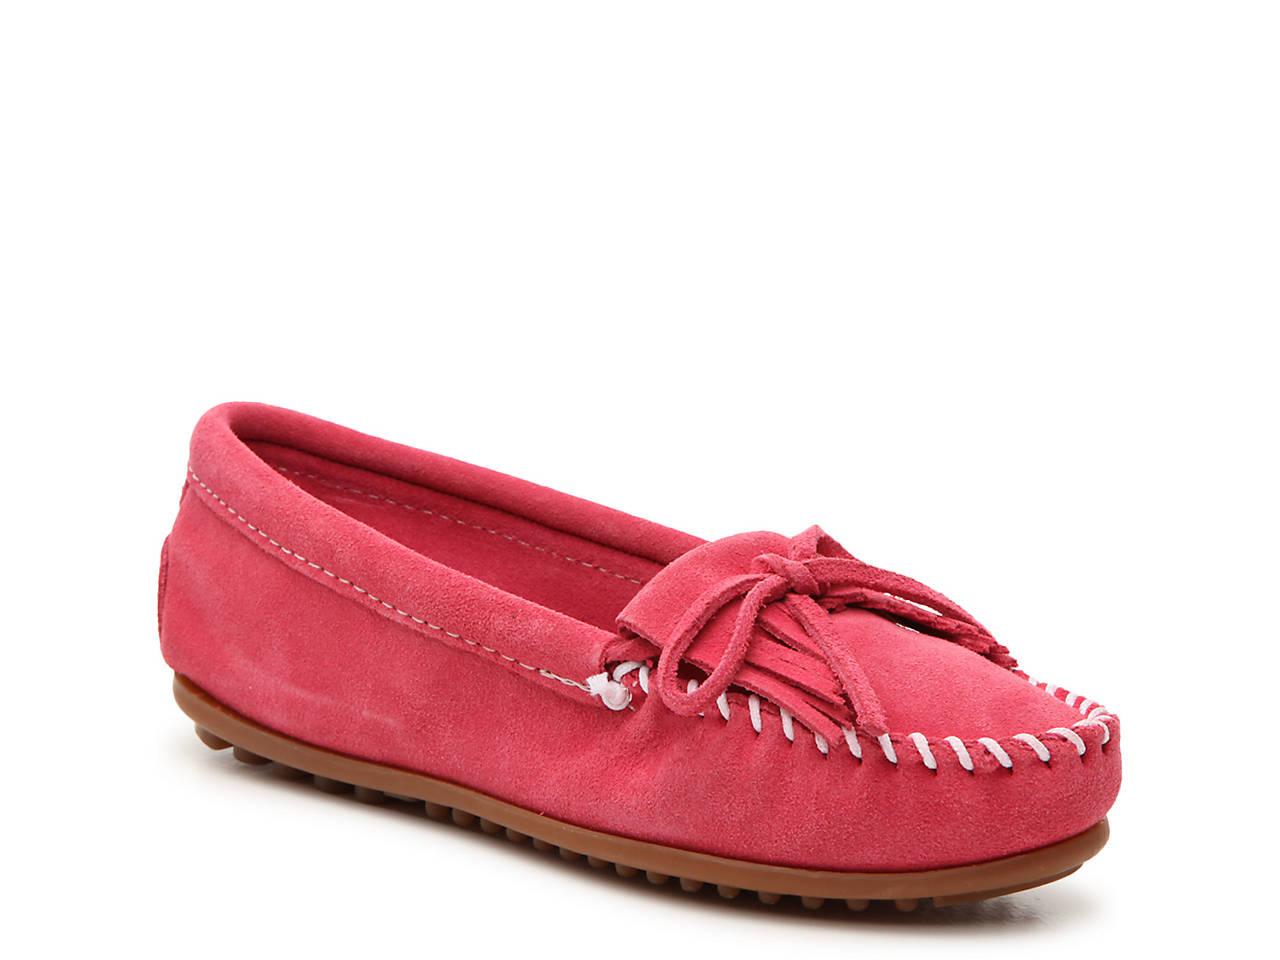 c952fb9f388 Minnetonka Kilty Moccasin Women s Shoes